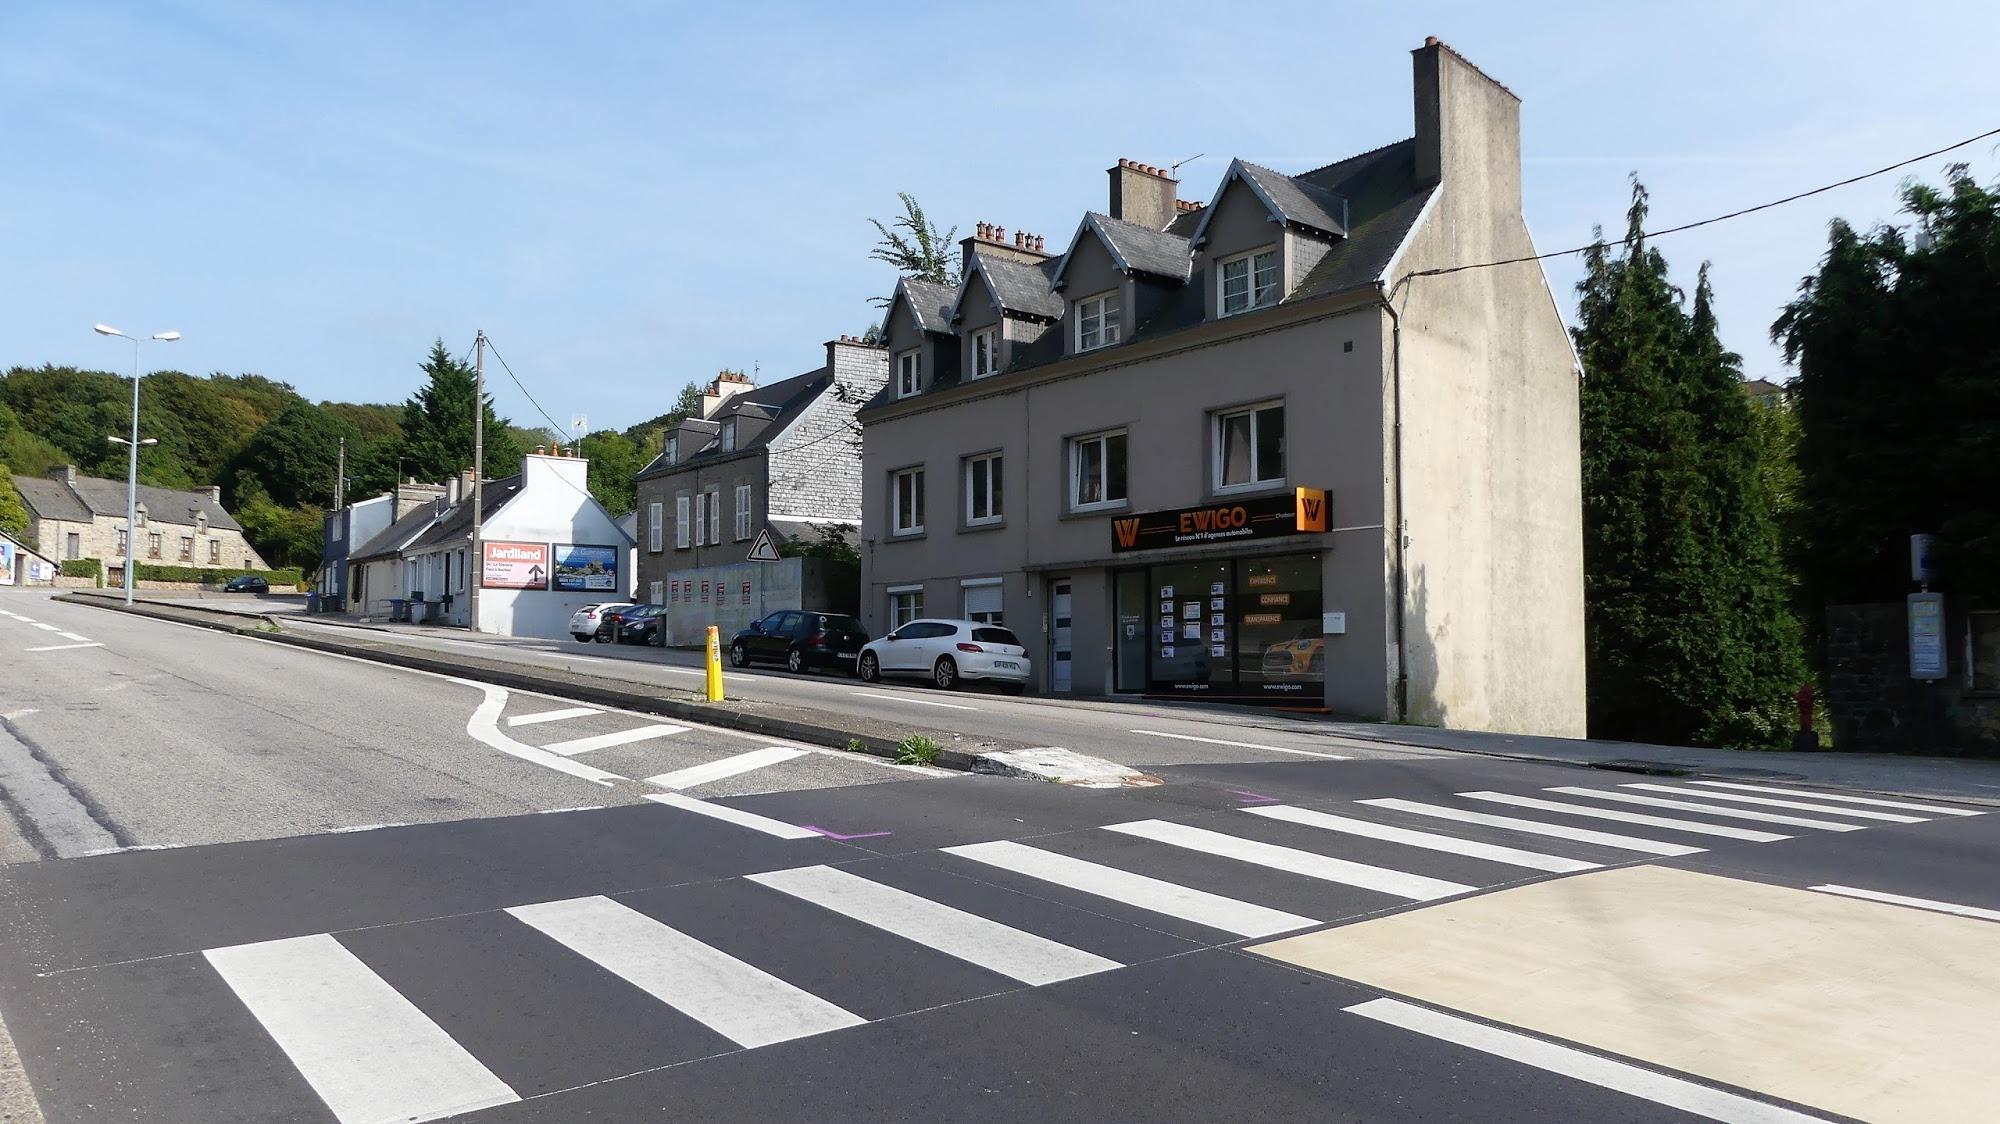 Ewigo Cherbourg CHERBOURG-EN-COTENTIN 6